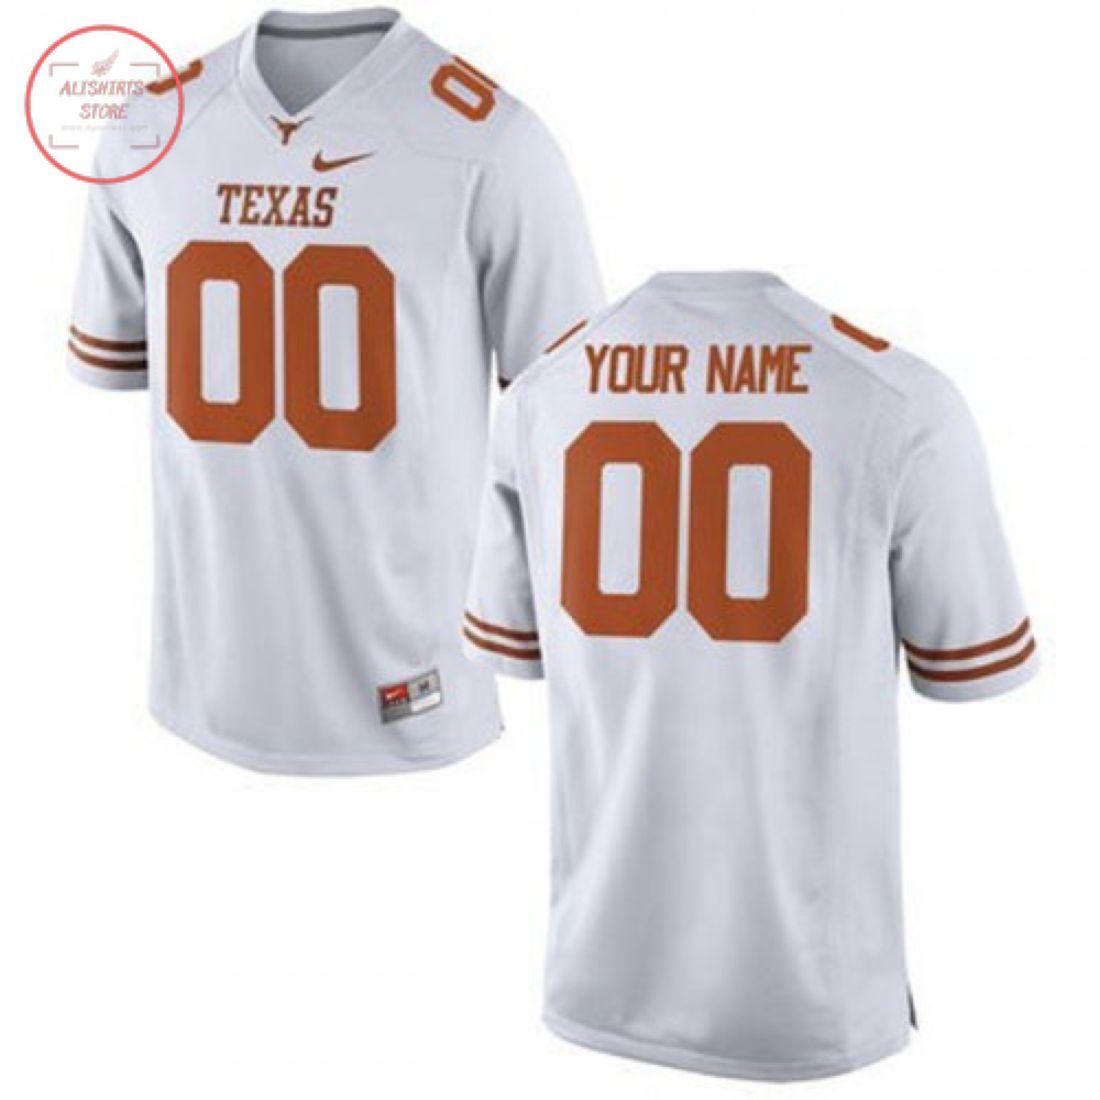 Texas Longhorns Custom White Football Jersey